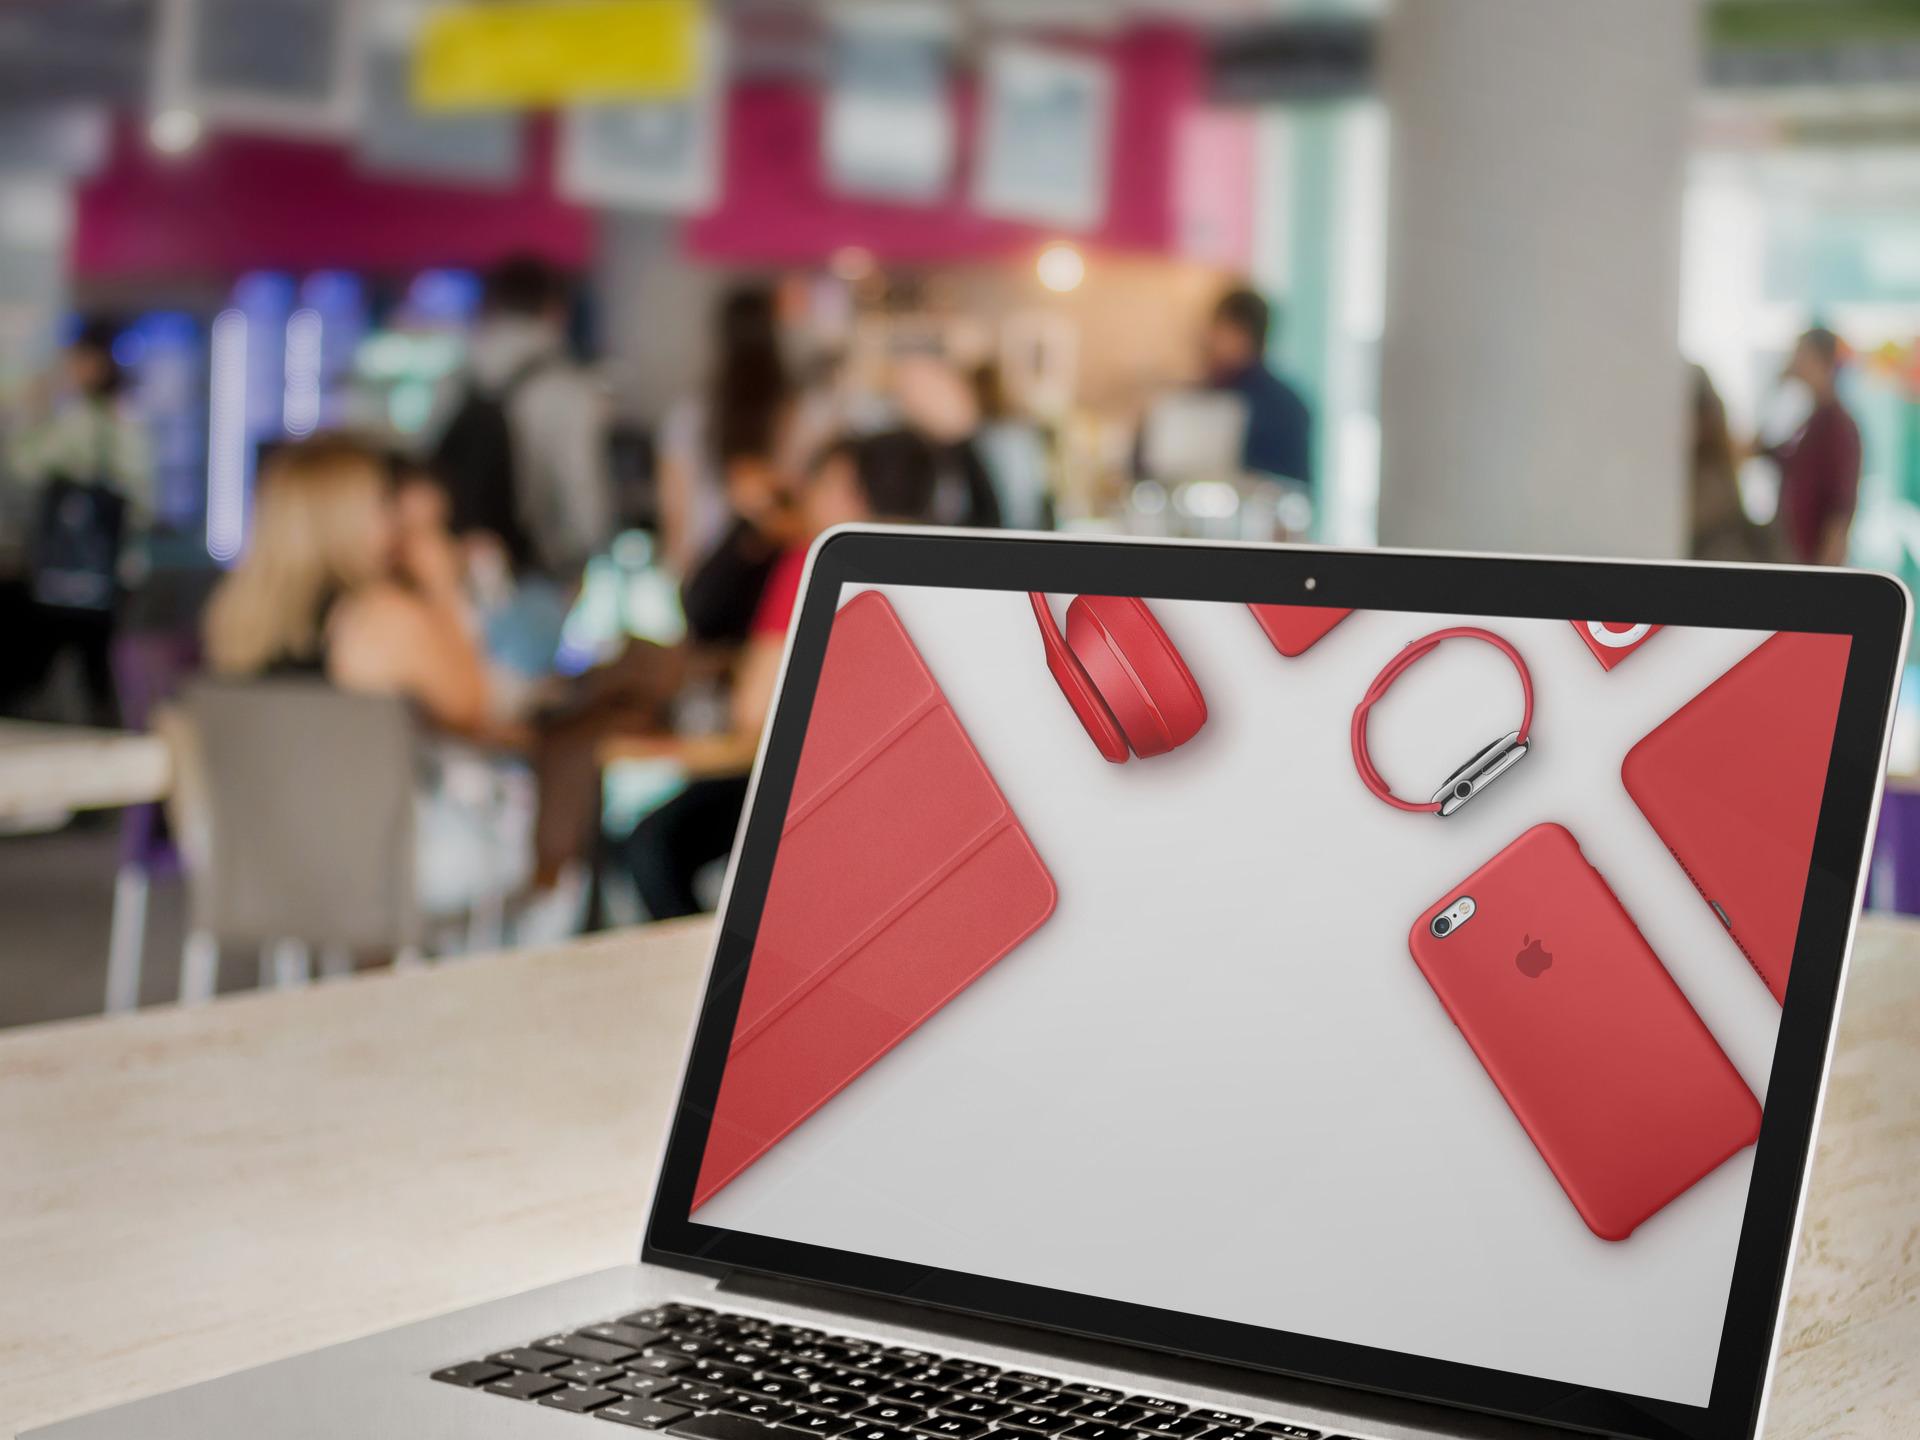 Apple Red products splash hero banner